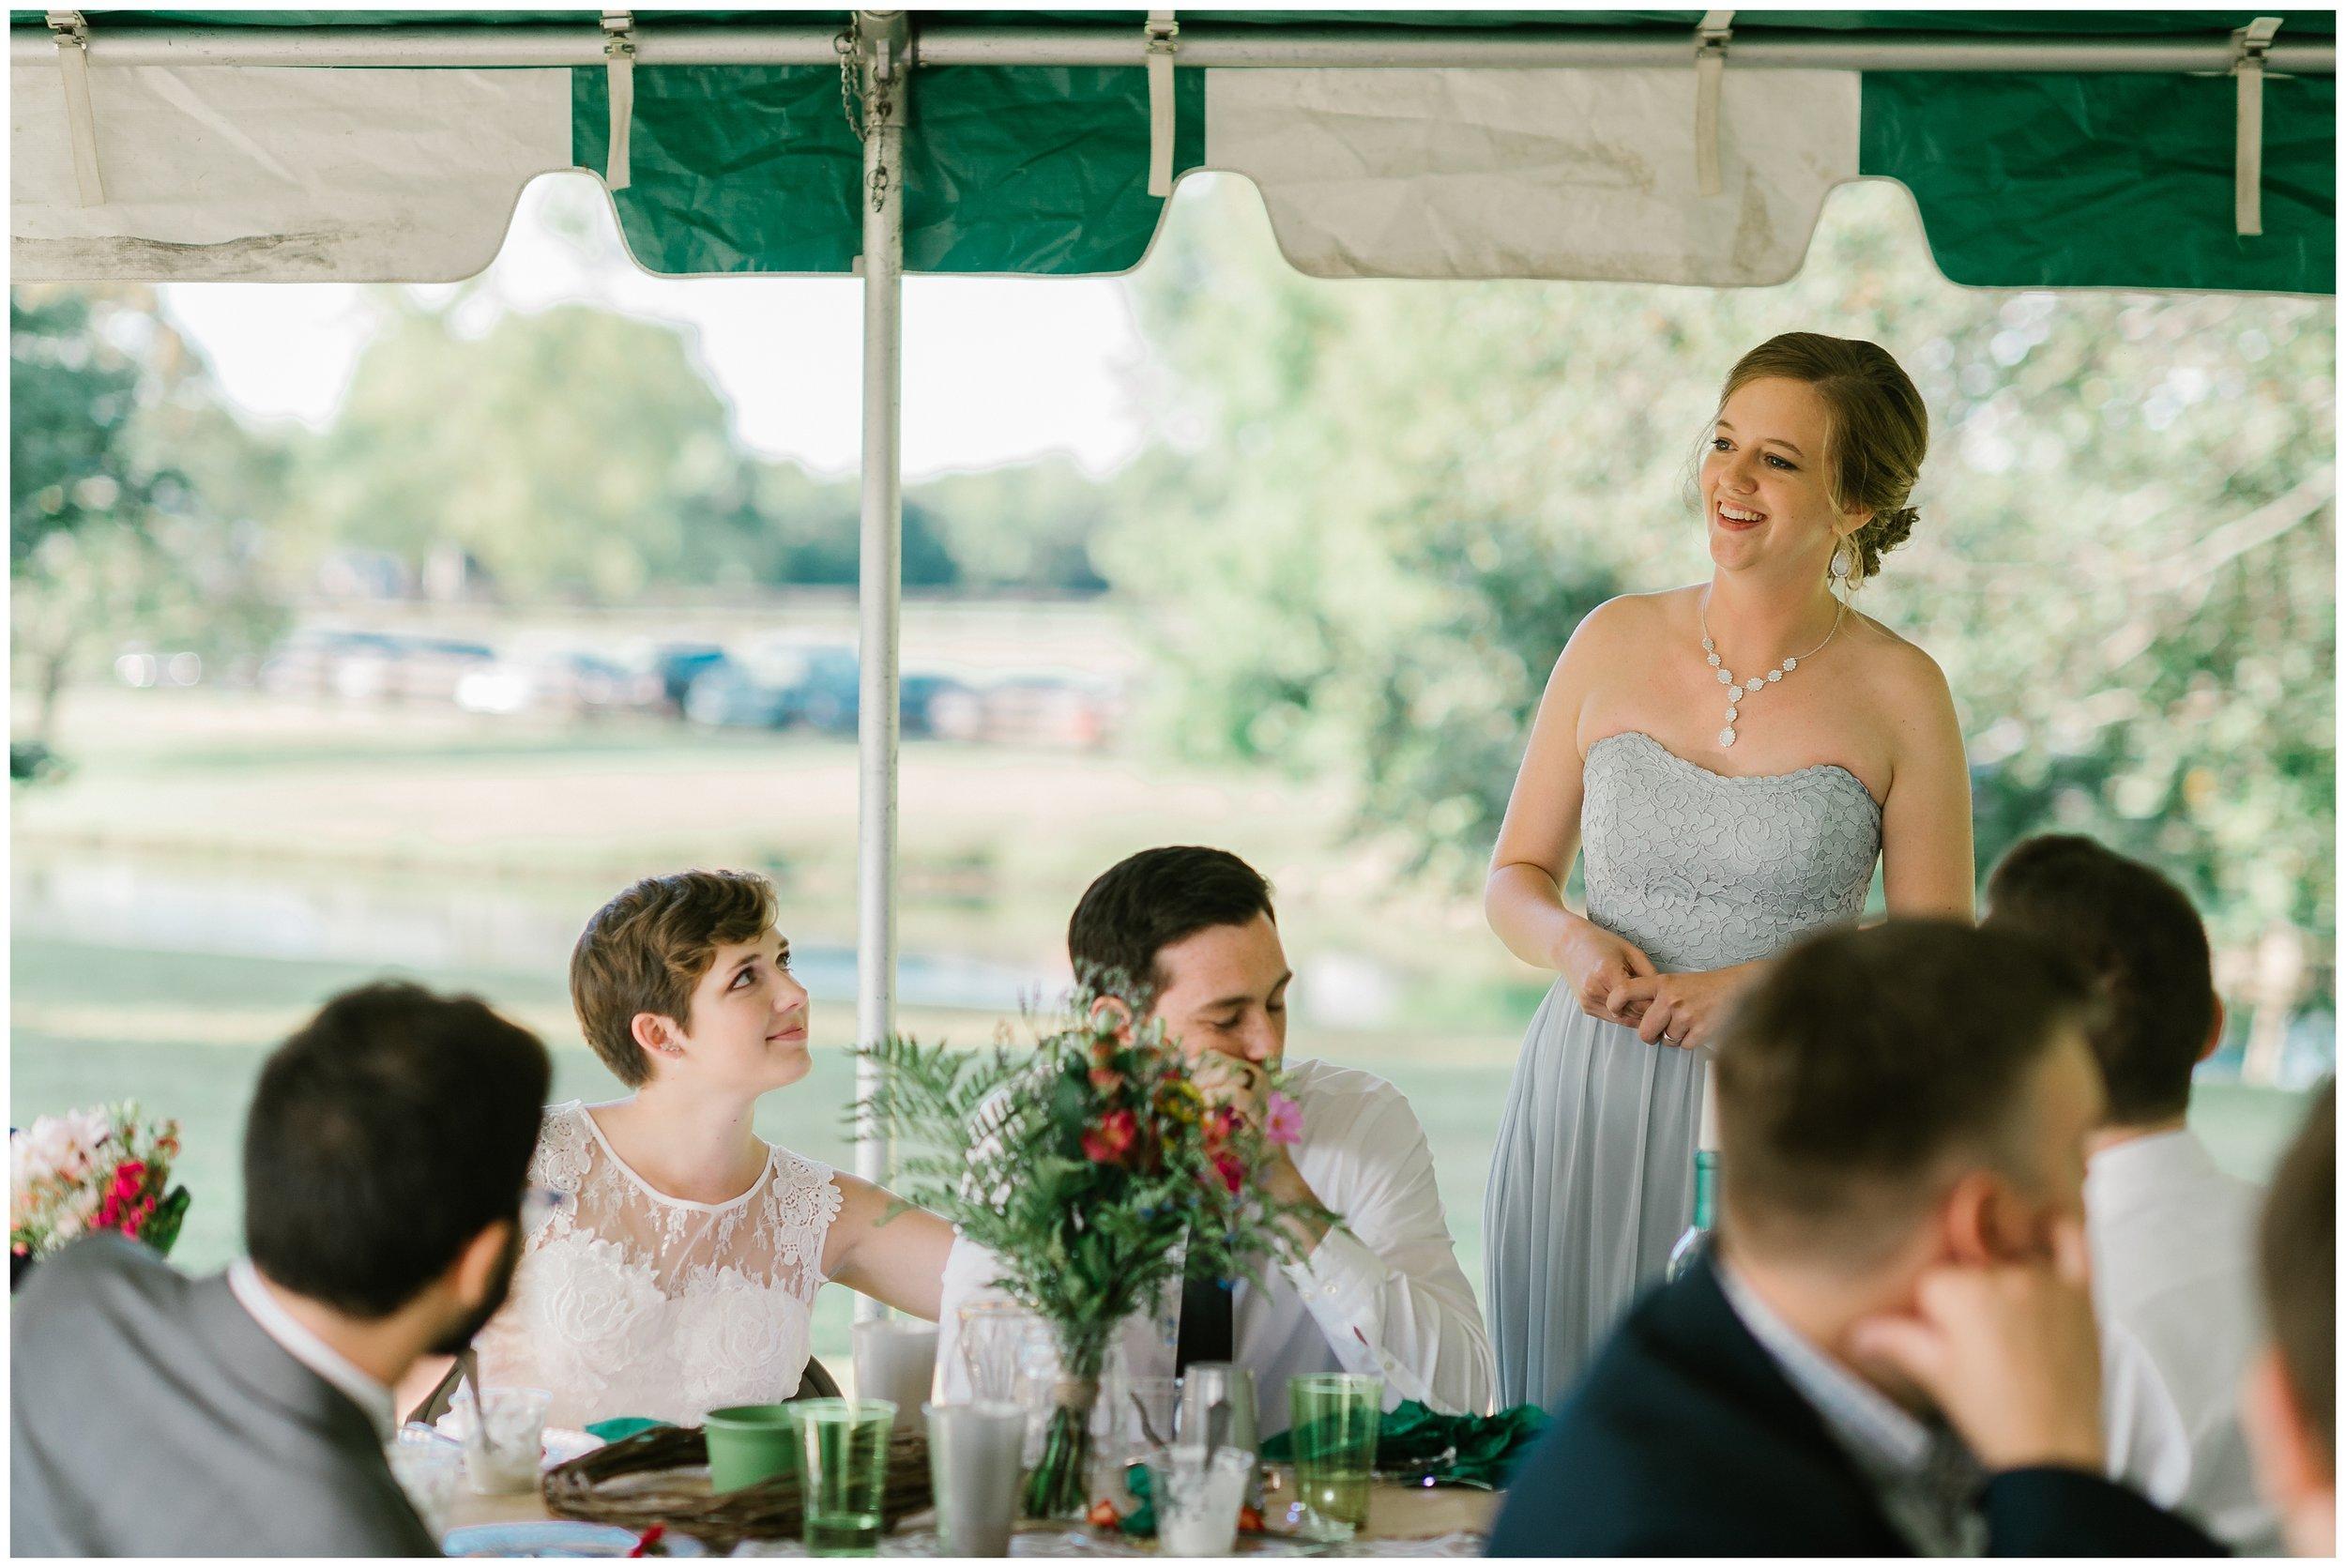 Rebecca_Shehorn_Photography_Indianapolis_Wedding_Photographer_7275.jpg